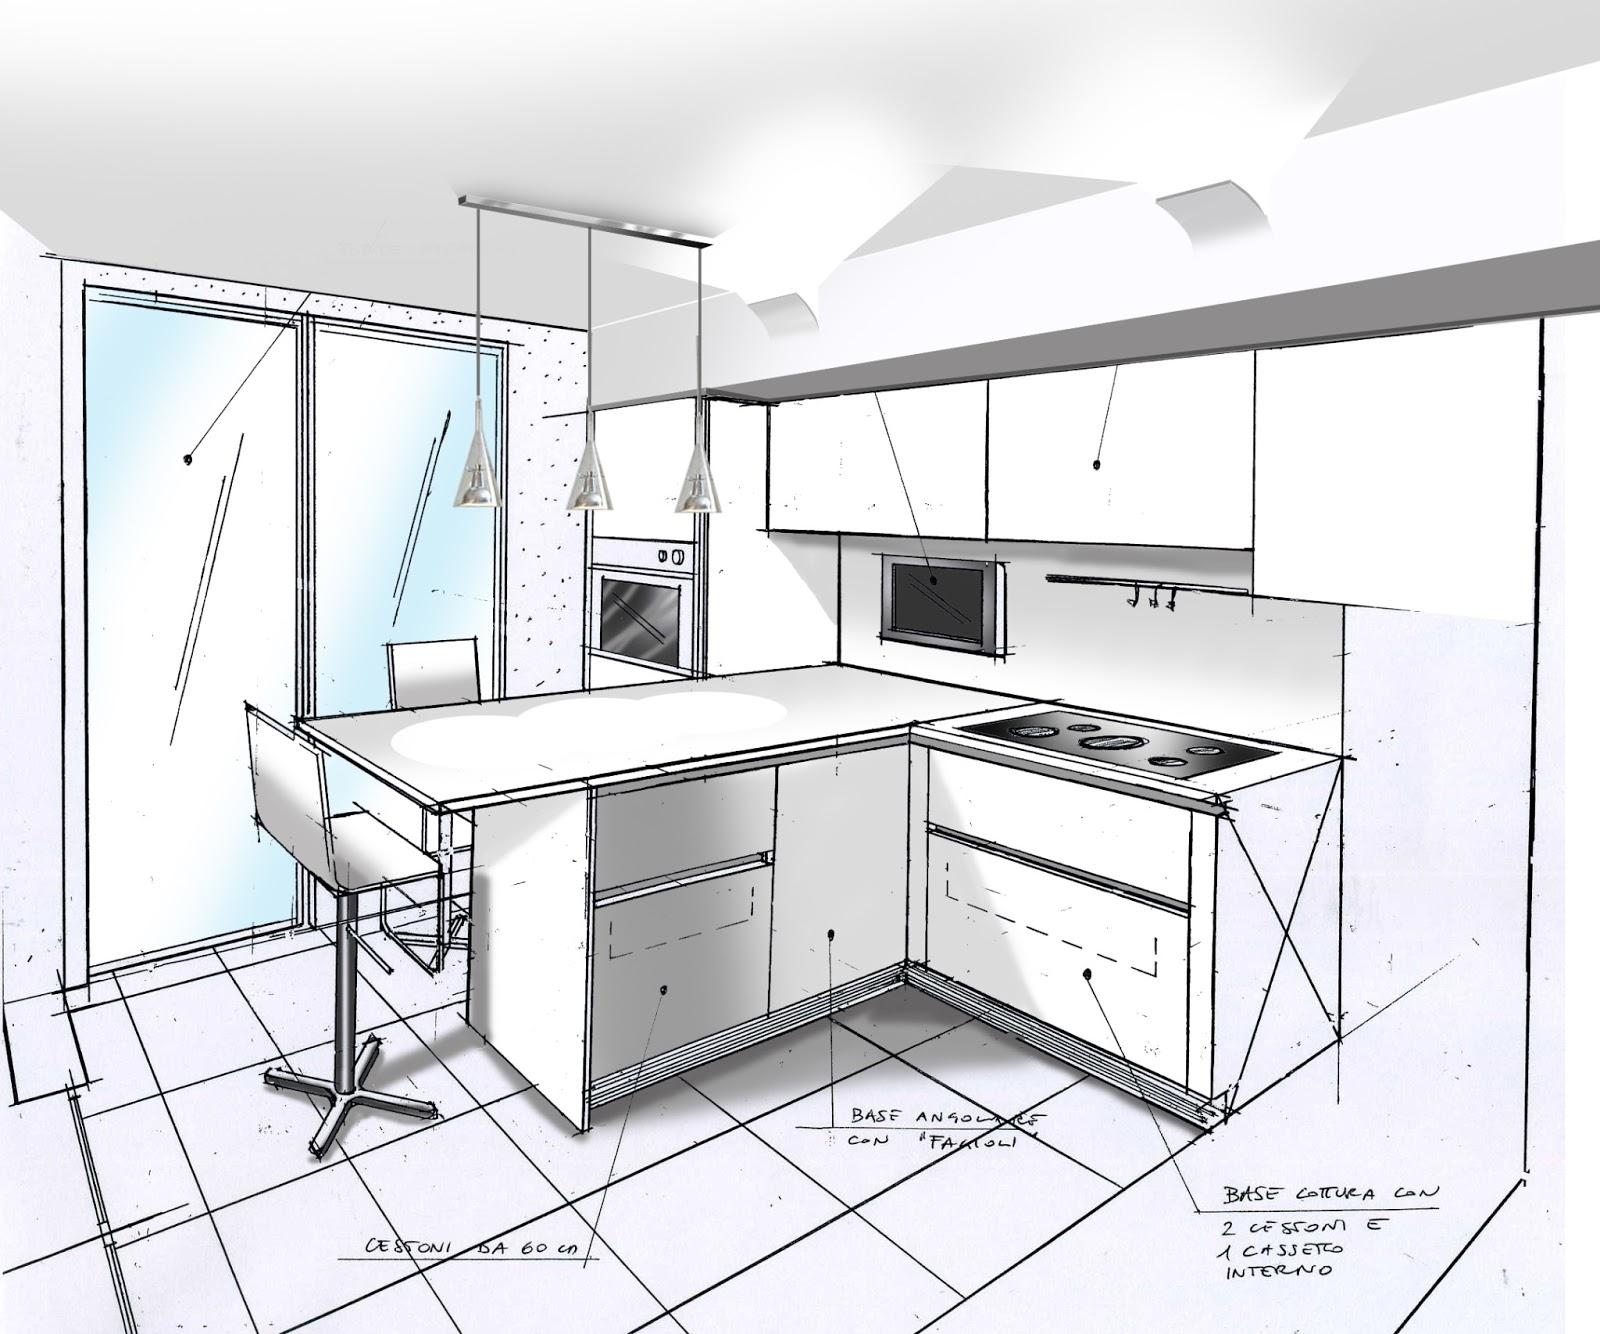 Disegni di cucine eb16 regardsdefemmes - Disegnare cucina ikea ...